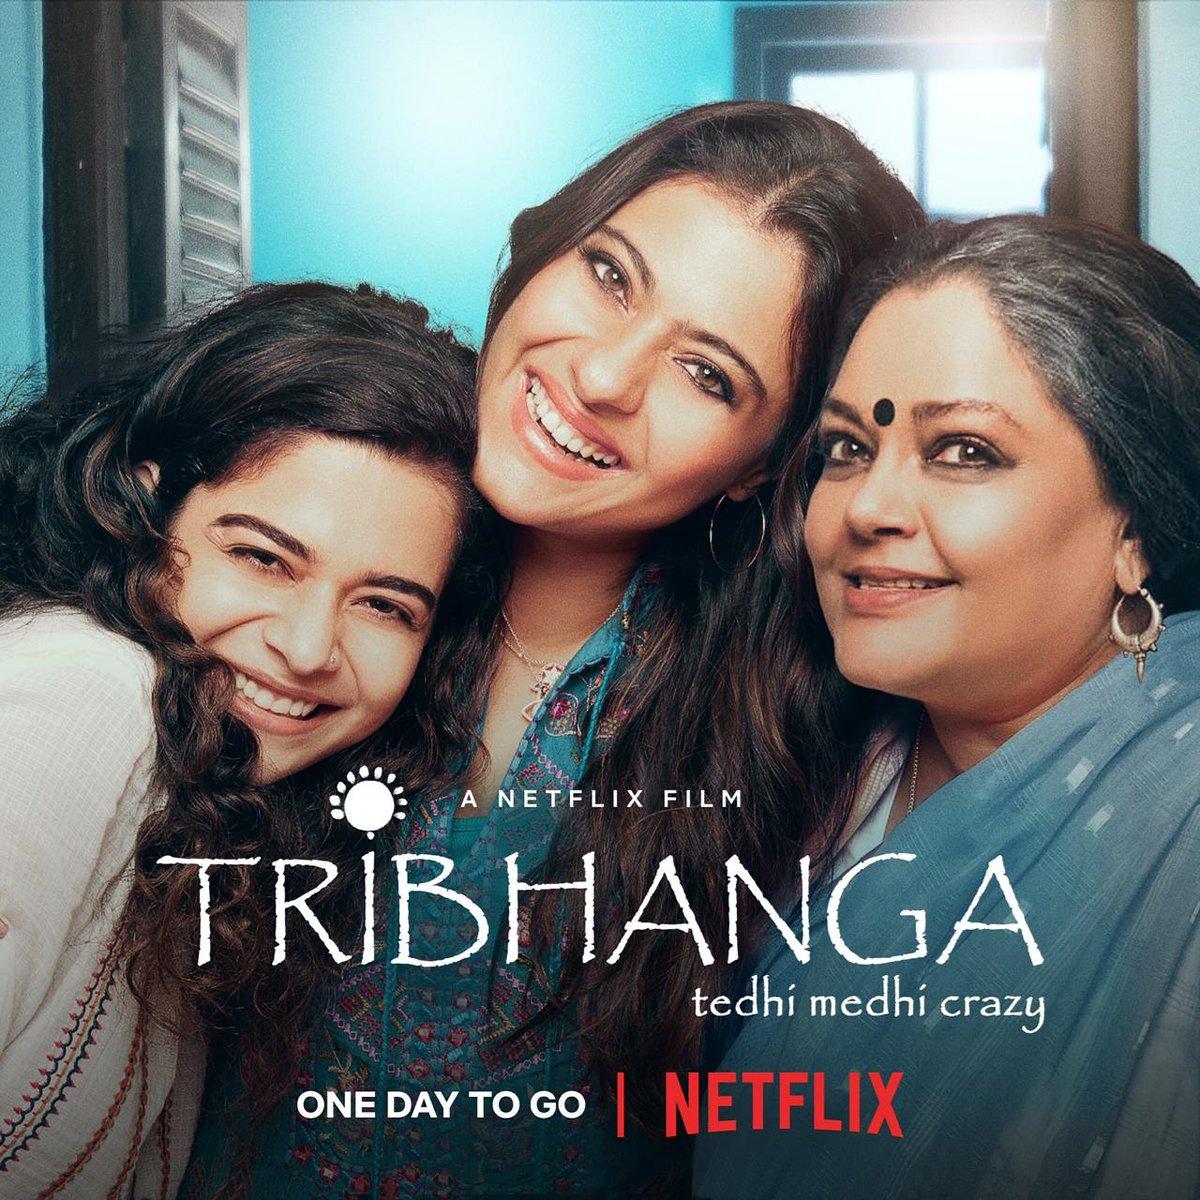 So excited. Just 1 day to go #Tribhanga @ajaydevgn @ADFFilms @Banijayasia @deepak30000 @NegiR @AlchemyFilms @sidpmalhotra @ParagDesai @itsKajolD @mipalkar  @ikunaalroykapur @Meena_Iyer @KumarMangat @NetflixIndia